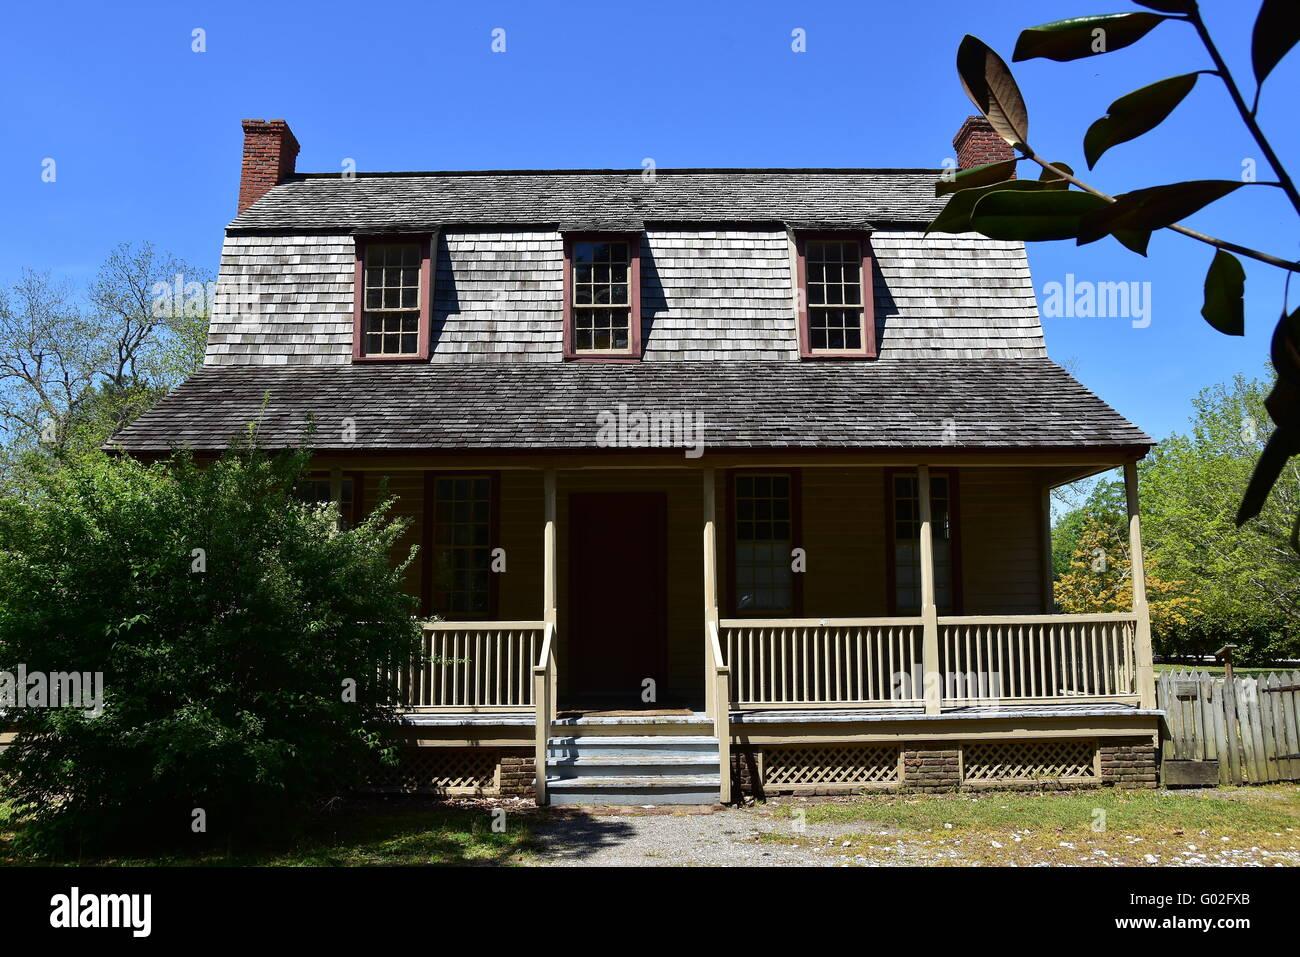 Bath North Carolina 1790 Van Der Veer Dutch Colonial Home With Stock Photo Alamy